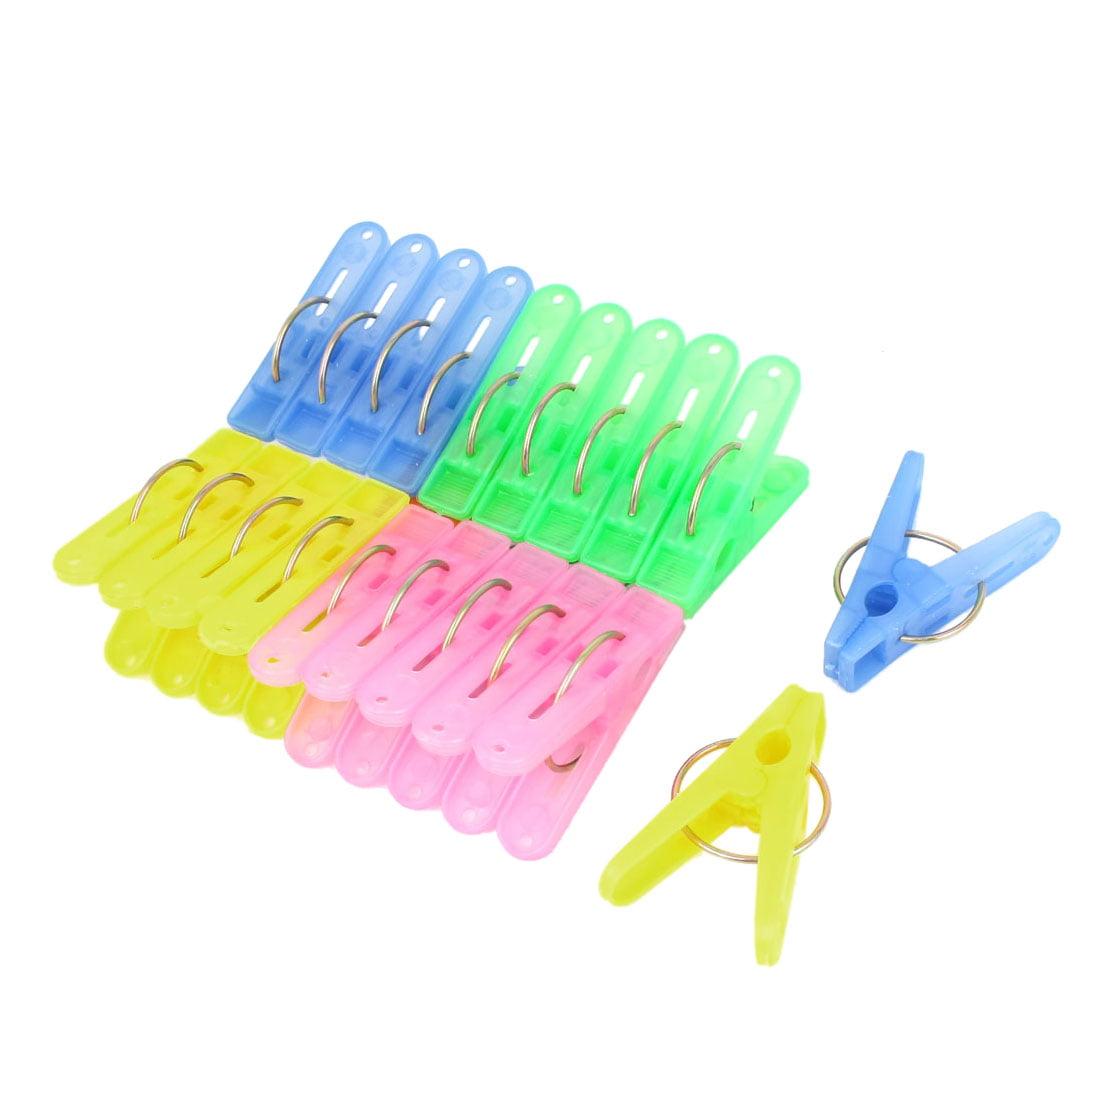 20 Pcs Household Plastic Nonslip Multipurpose Clothing Clothespins Clips Multicolour